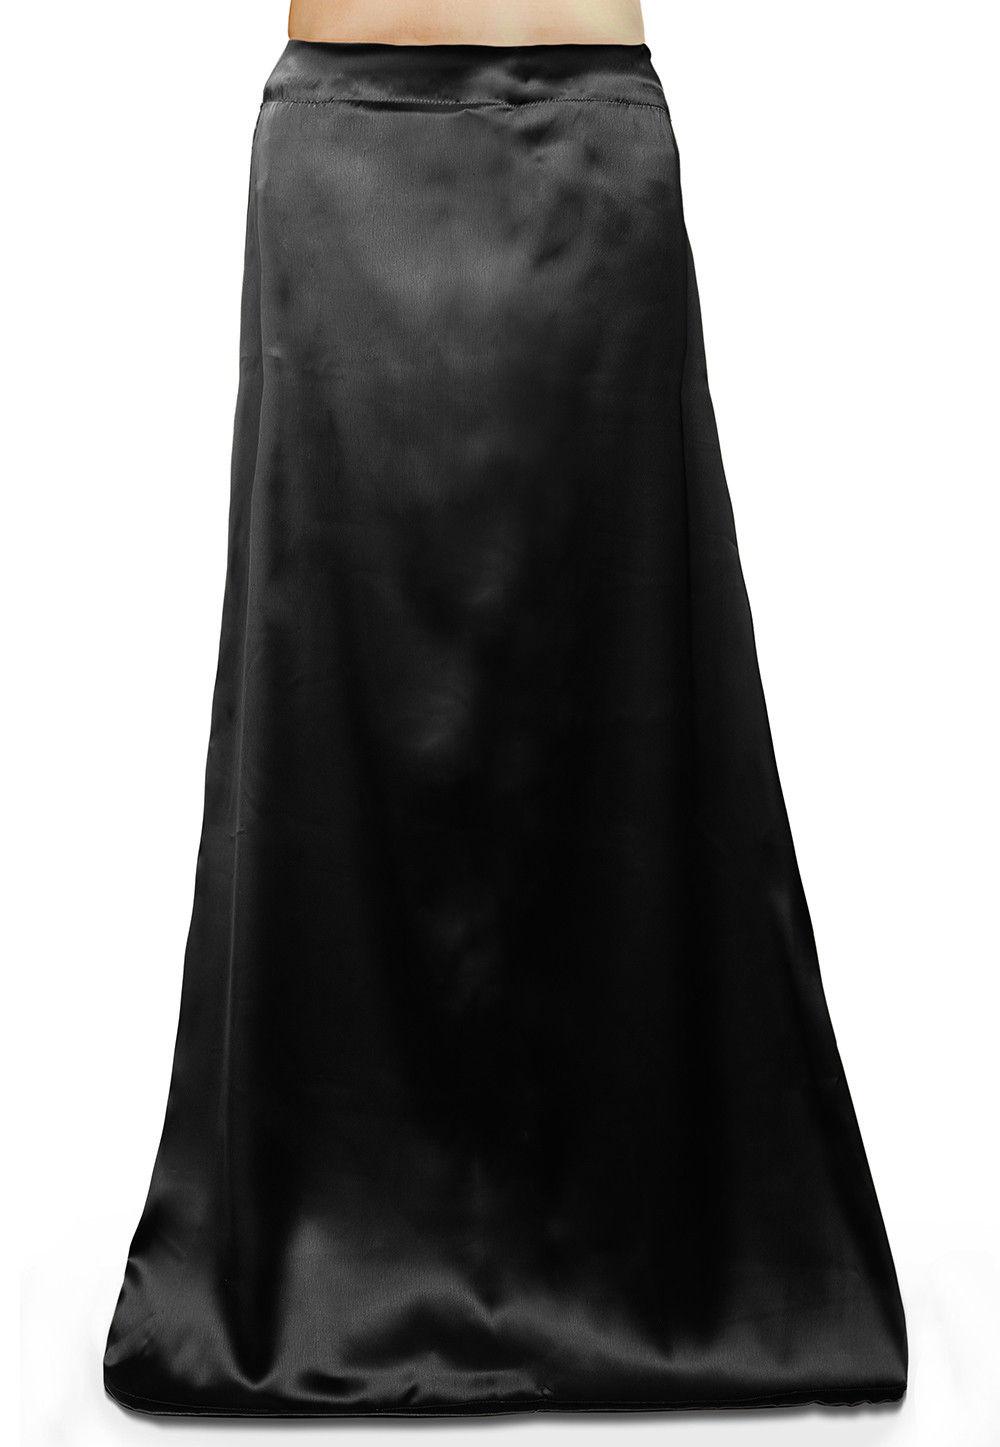 Satin Petticoat in Black